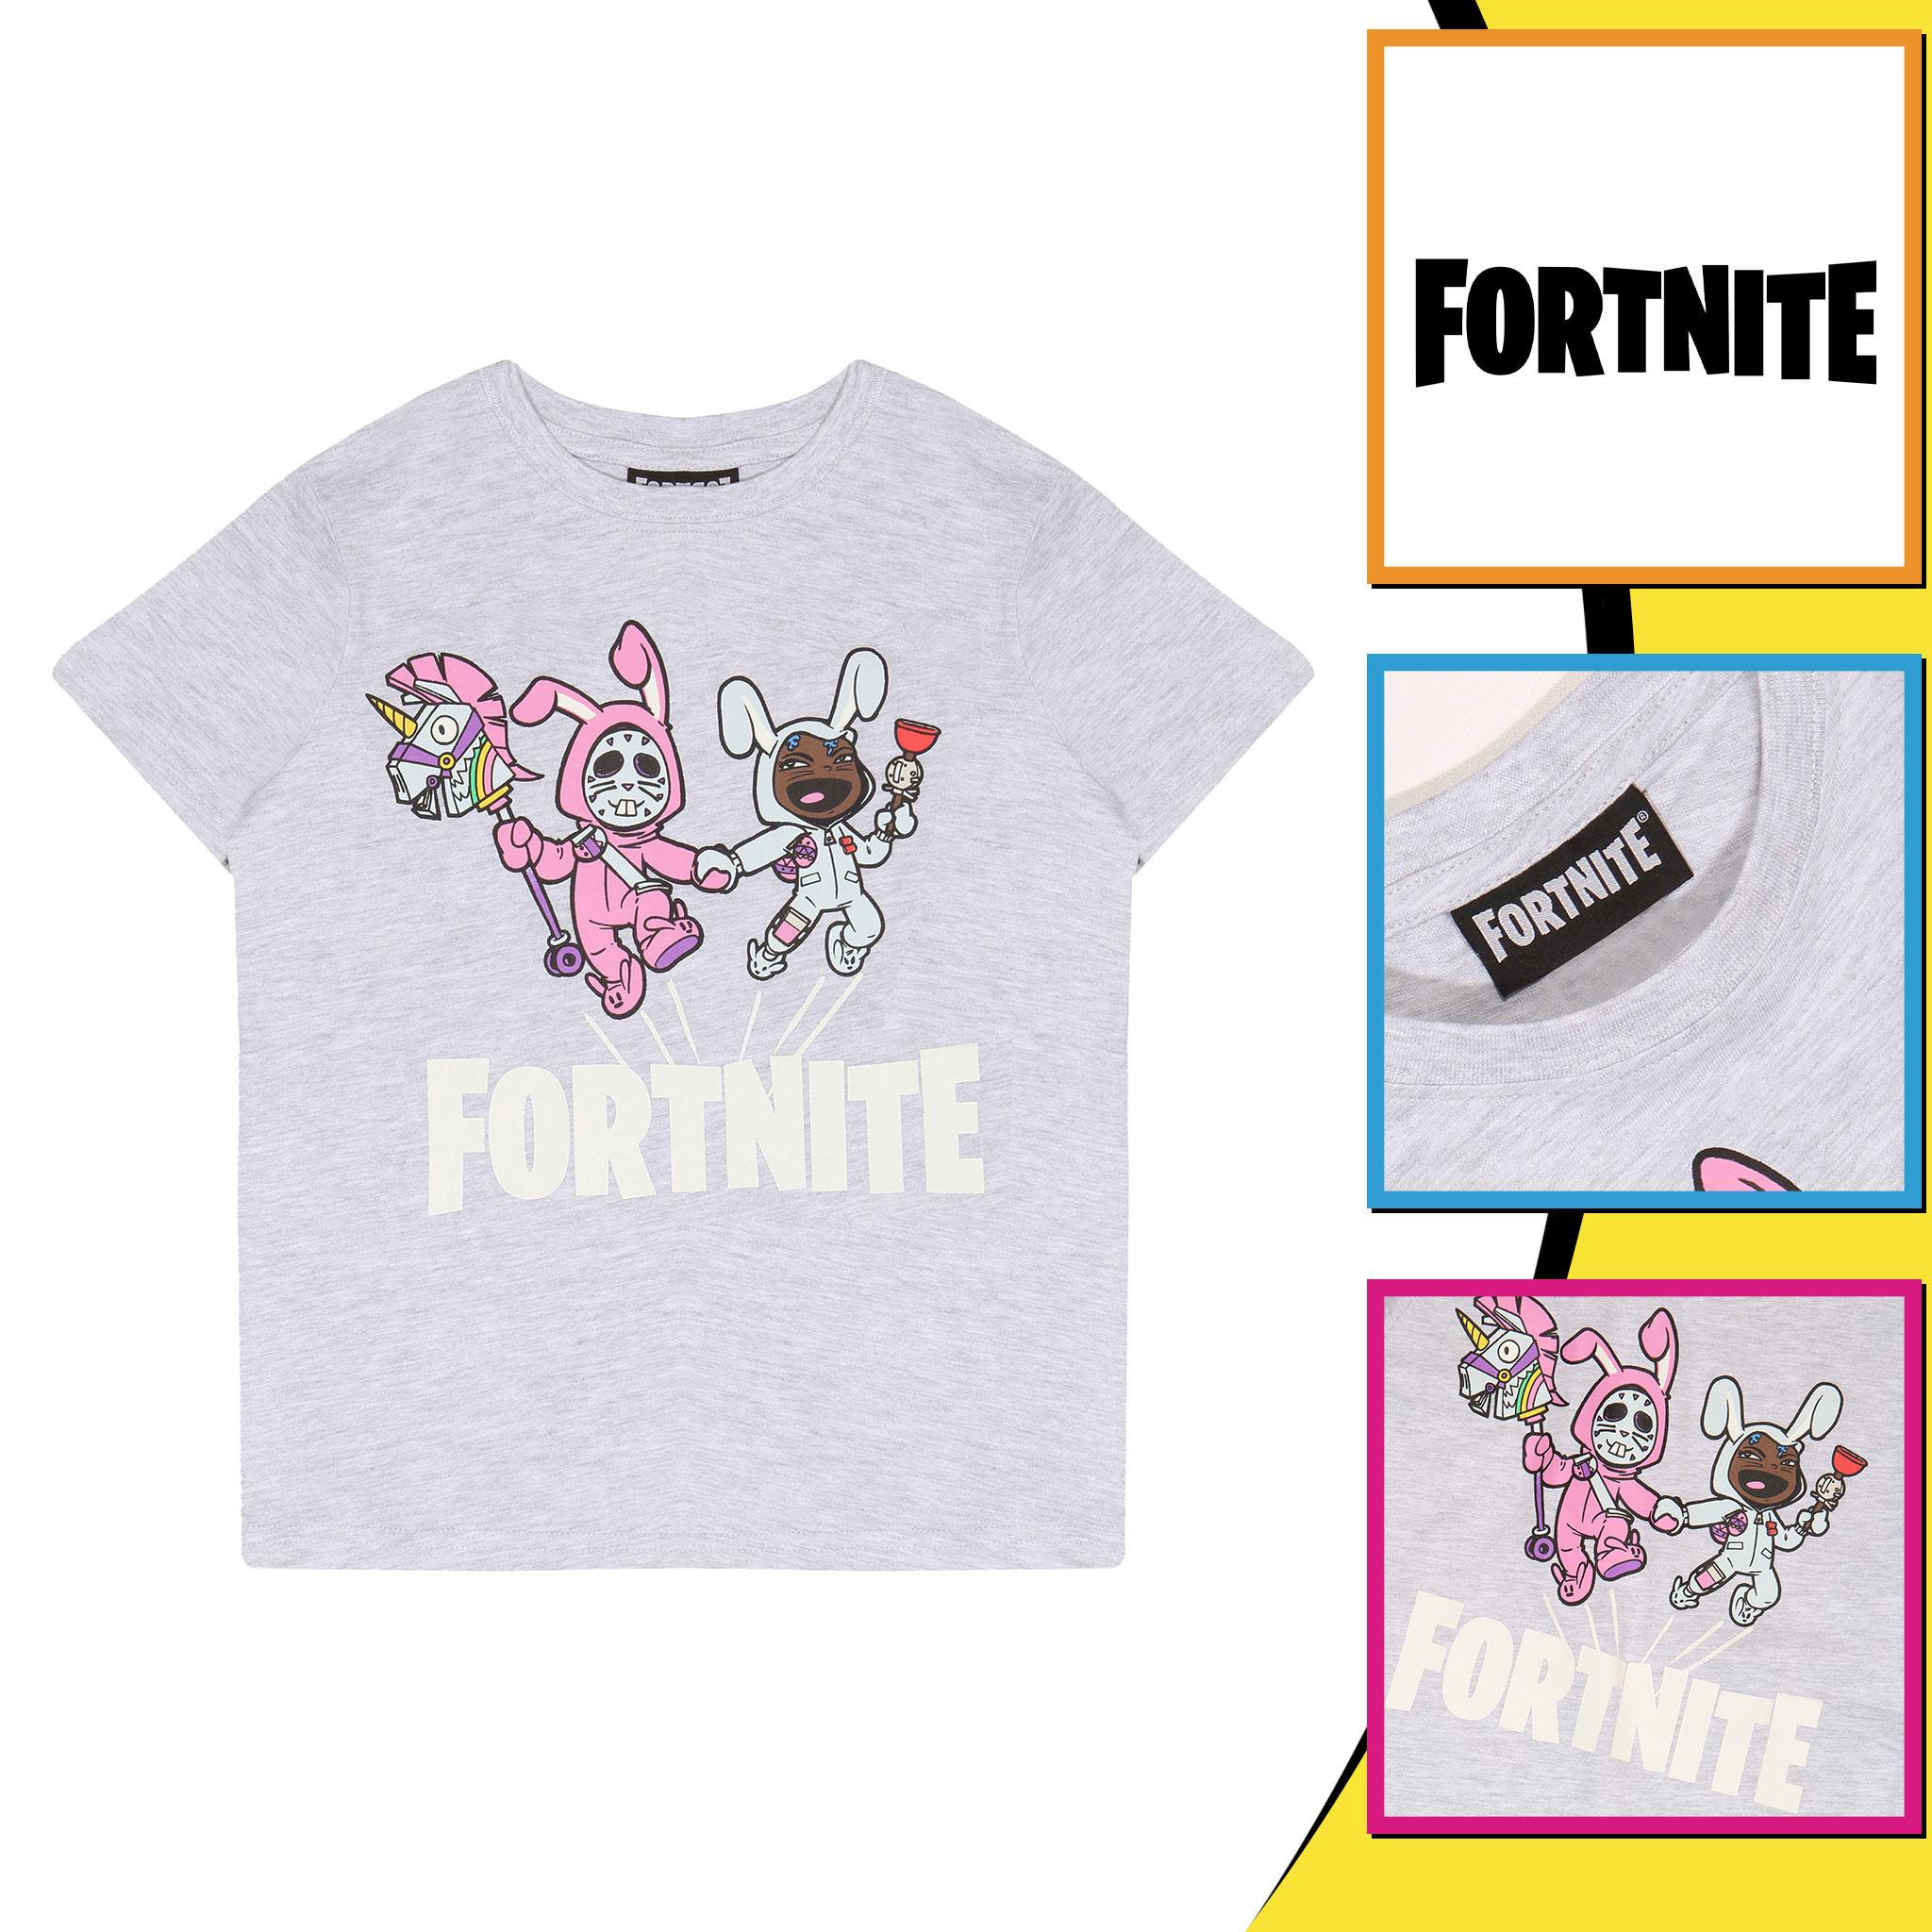 miniature 11 - Boys Fortnite T Shirt Bunny Trouble Official Merchandise